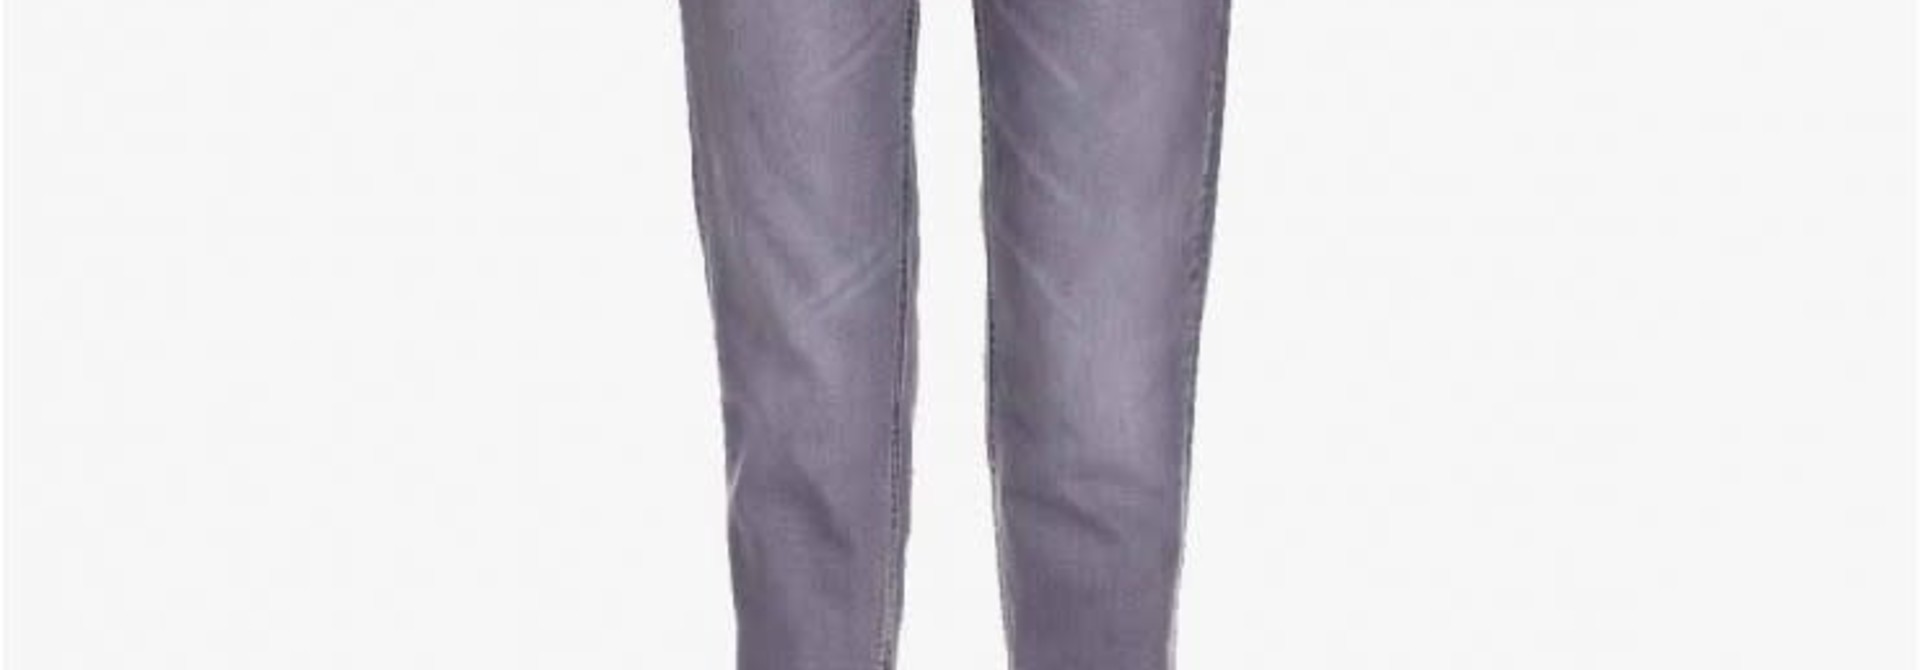 Aze jeans iro